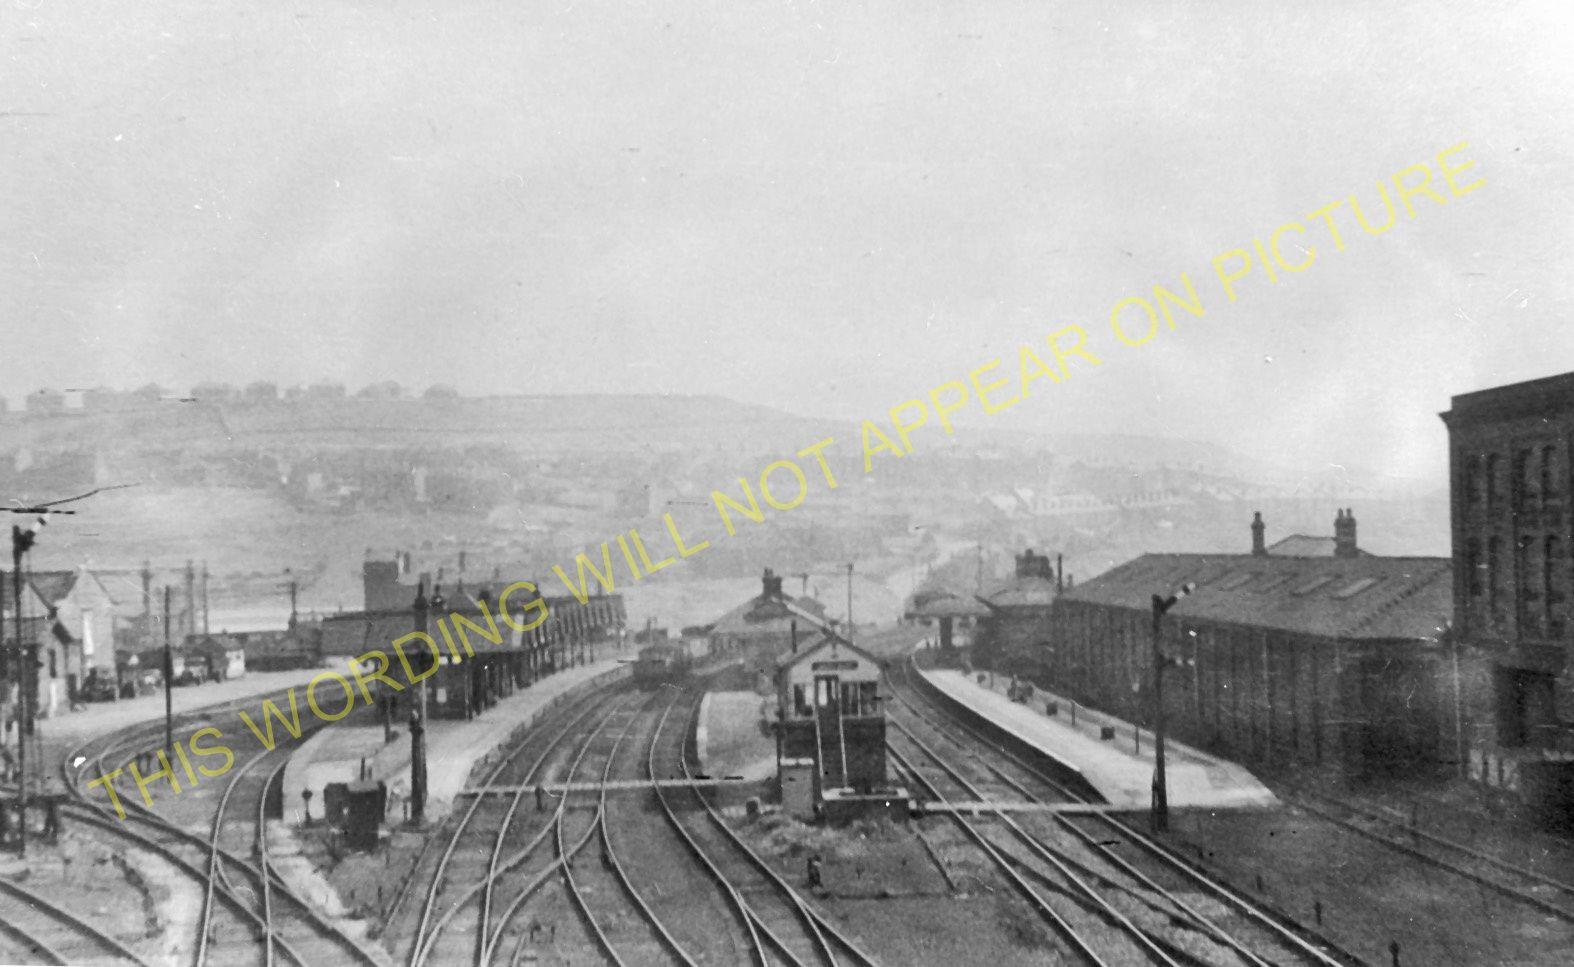 batley railway station photo dewsbury to howden clough. Black Bedroom Furniture Sets. Home Design Ideas